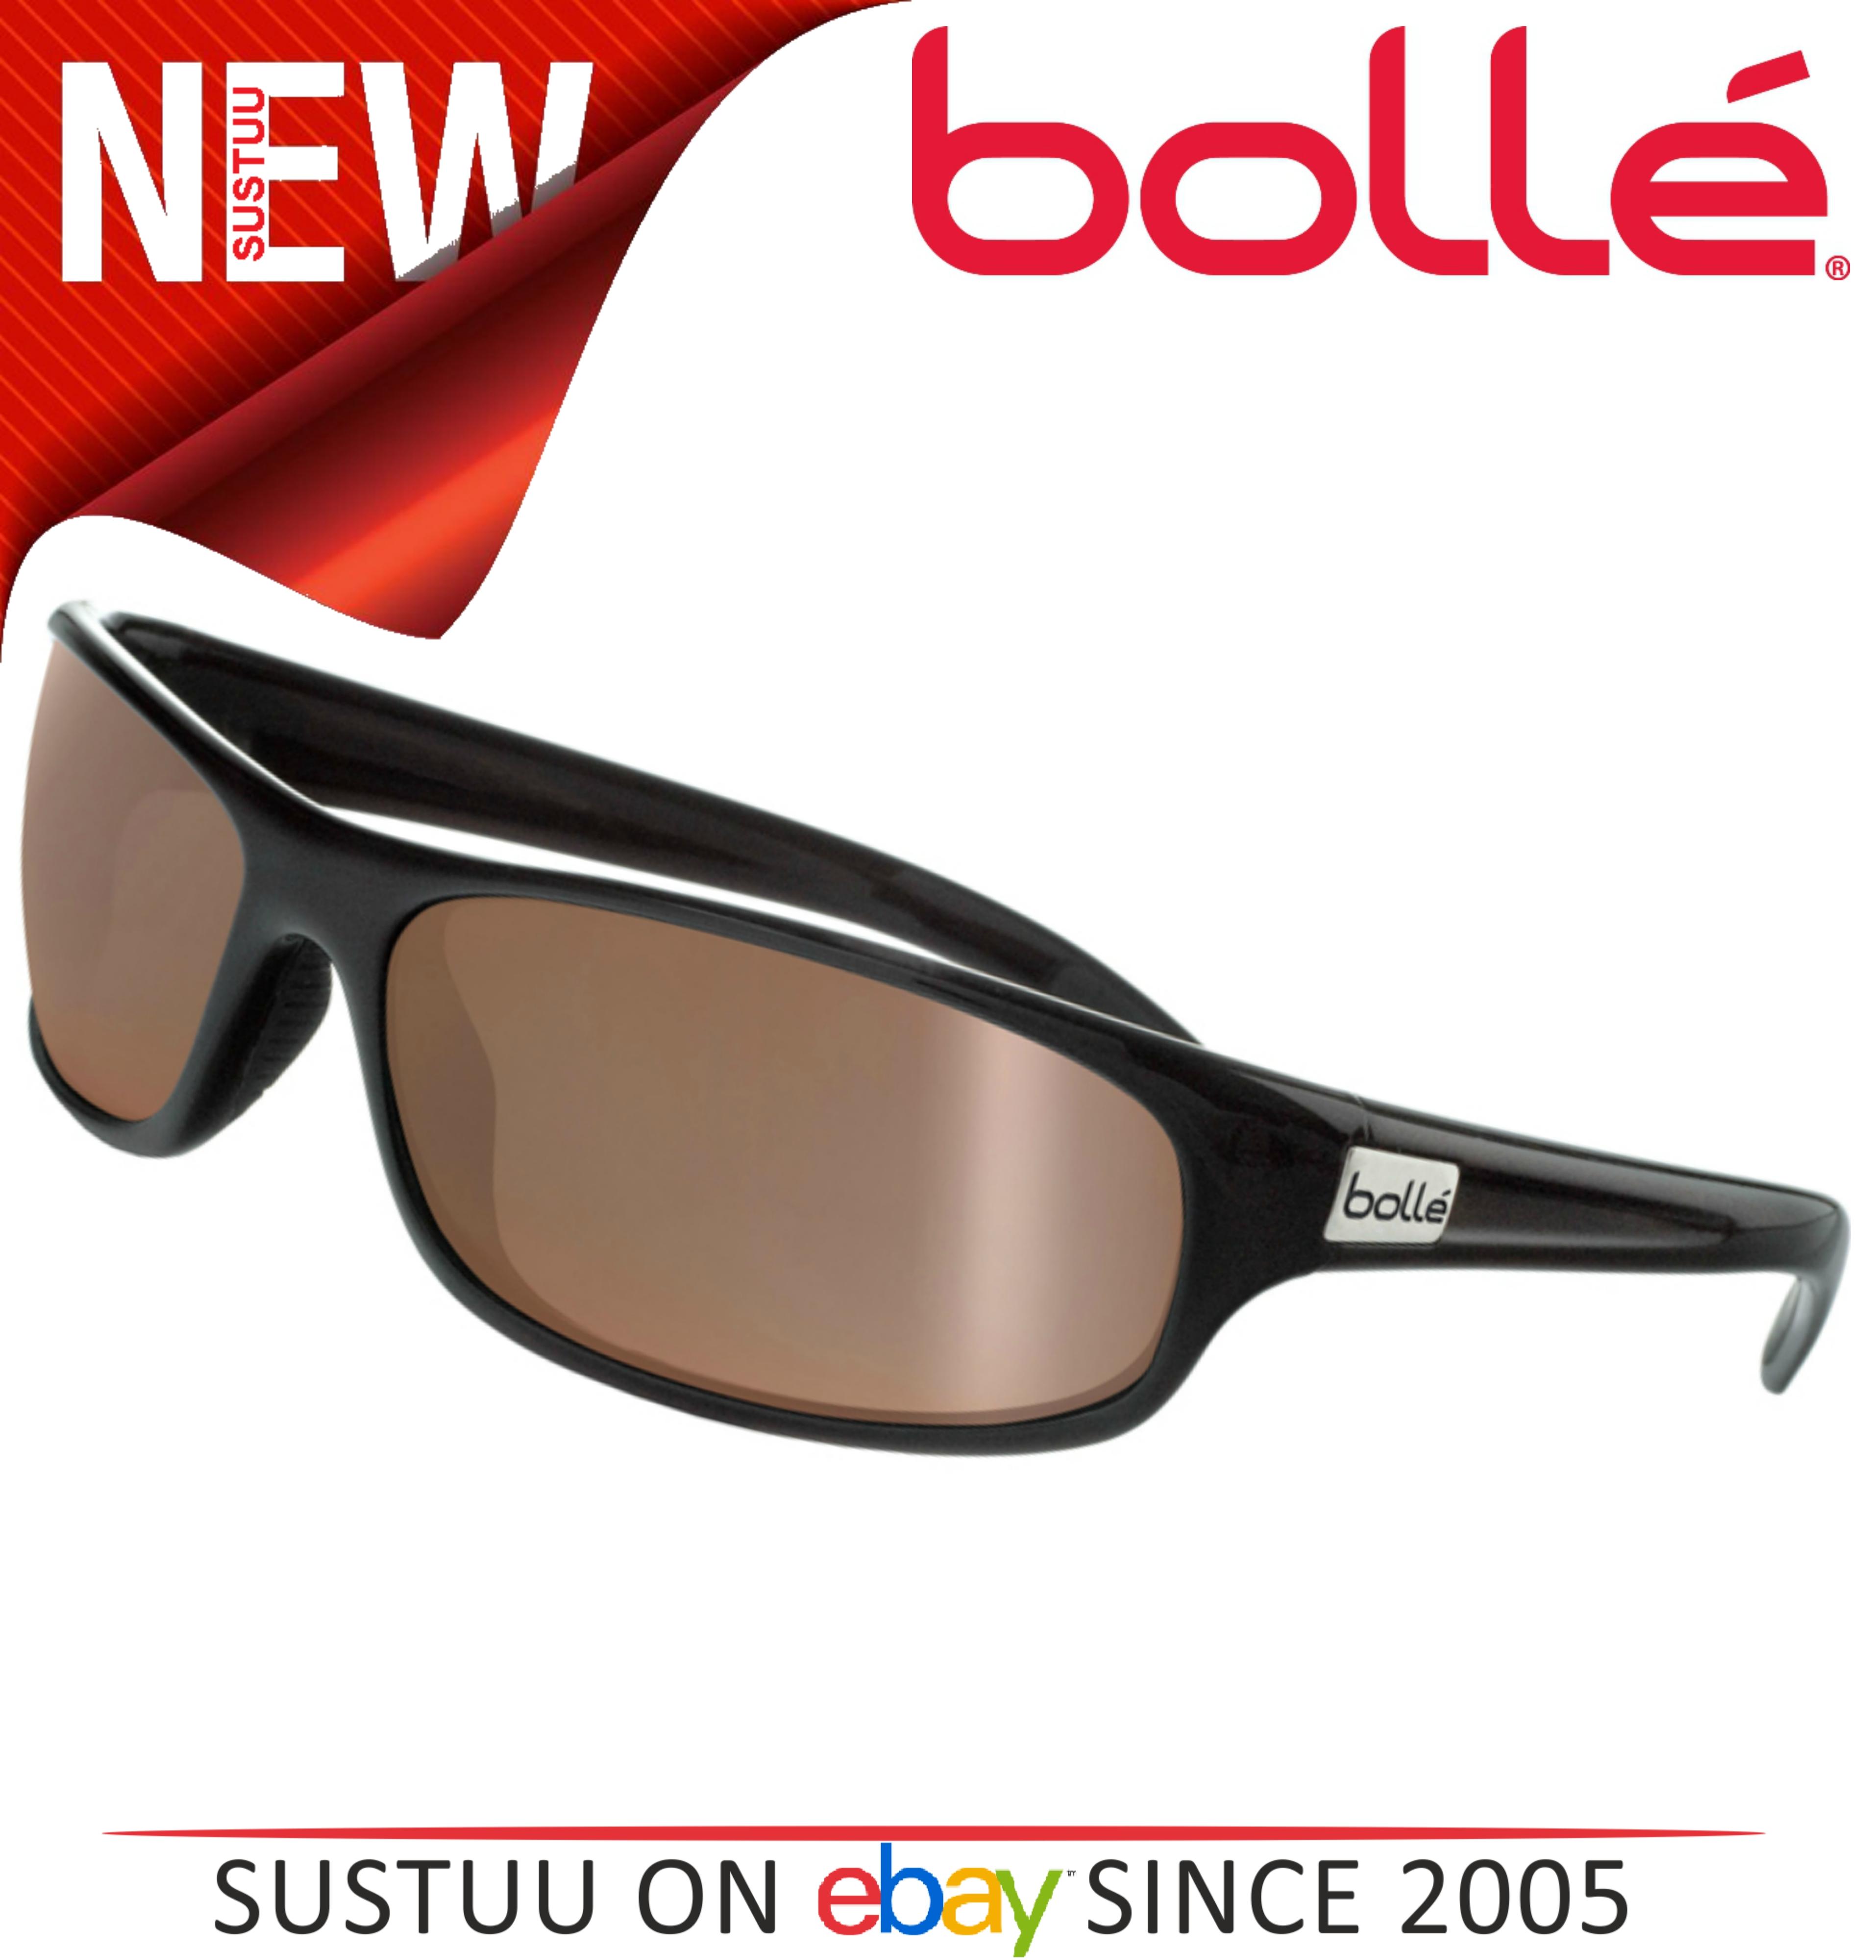 16752fcd521  BOLLÉ Anaconda Sunglasses Matte Black Frame   Polarized Inland Gold oleo  AF Lens